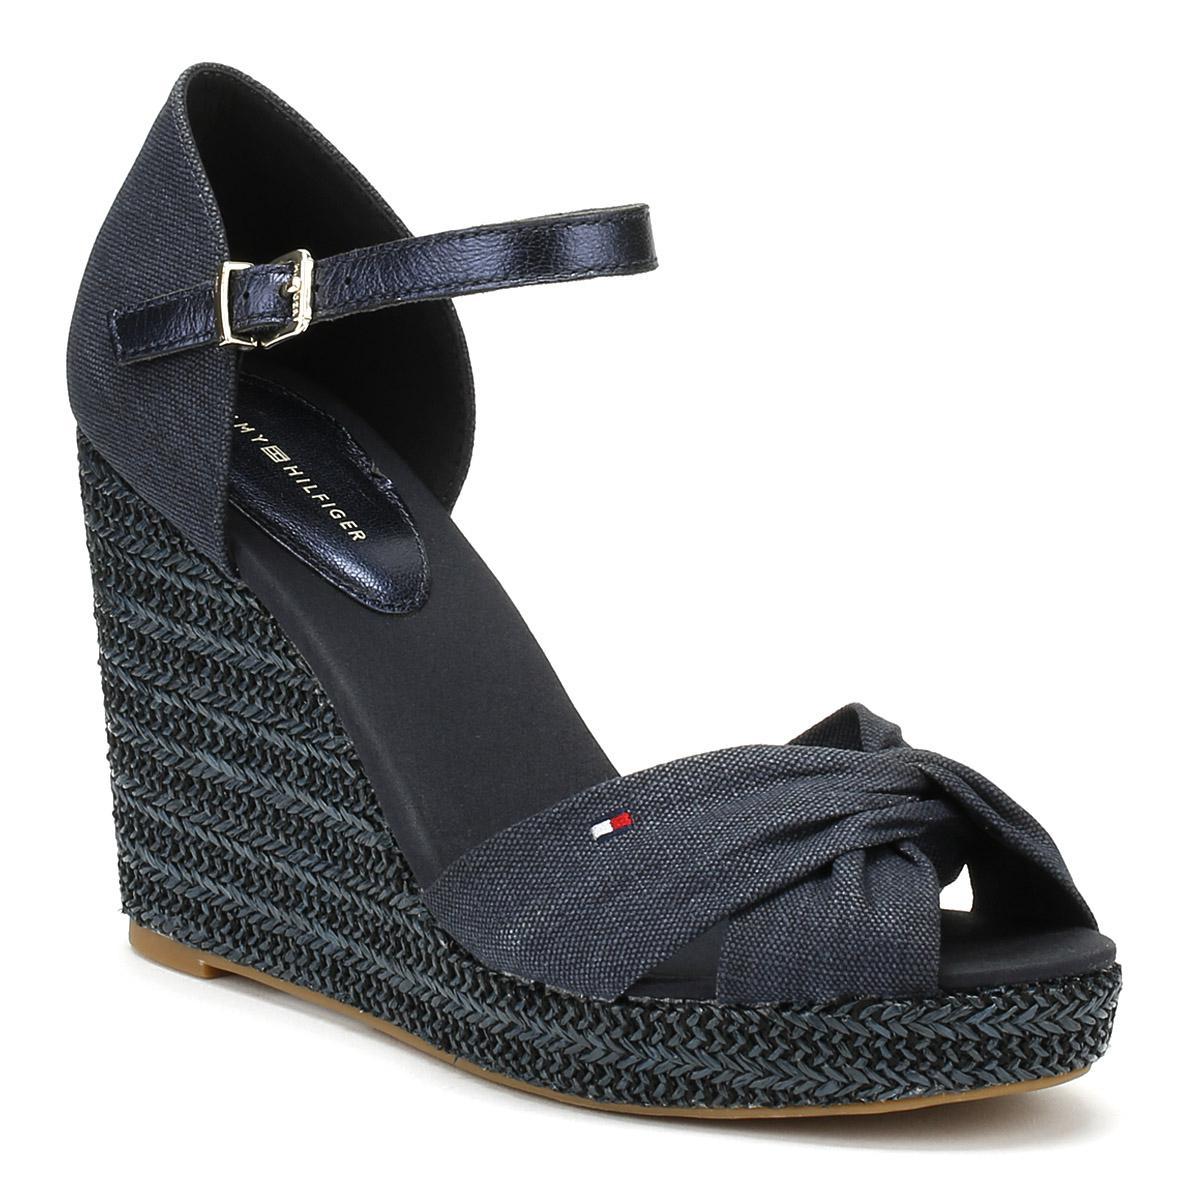 5ba16756bfe1 Tommy Hilfiger Womens Midnight Navy Metallic Elena Wedge Sandals in ...